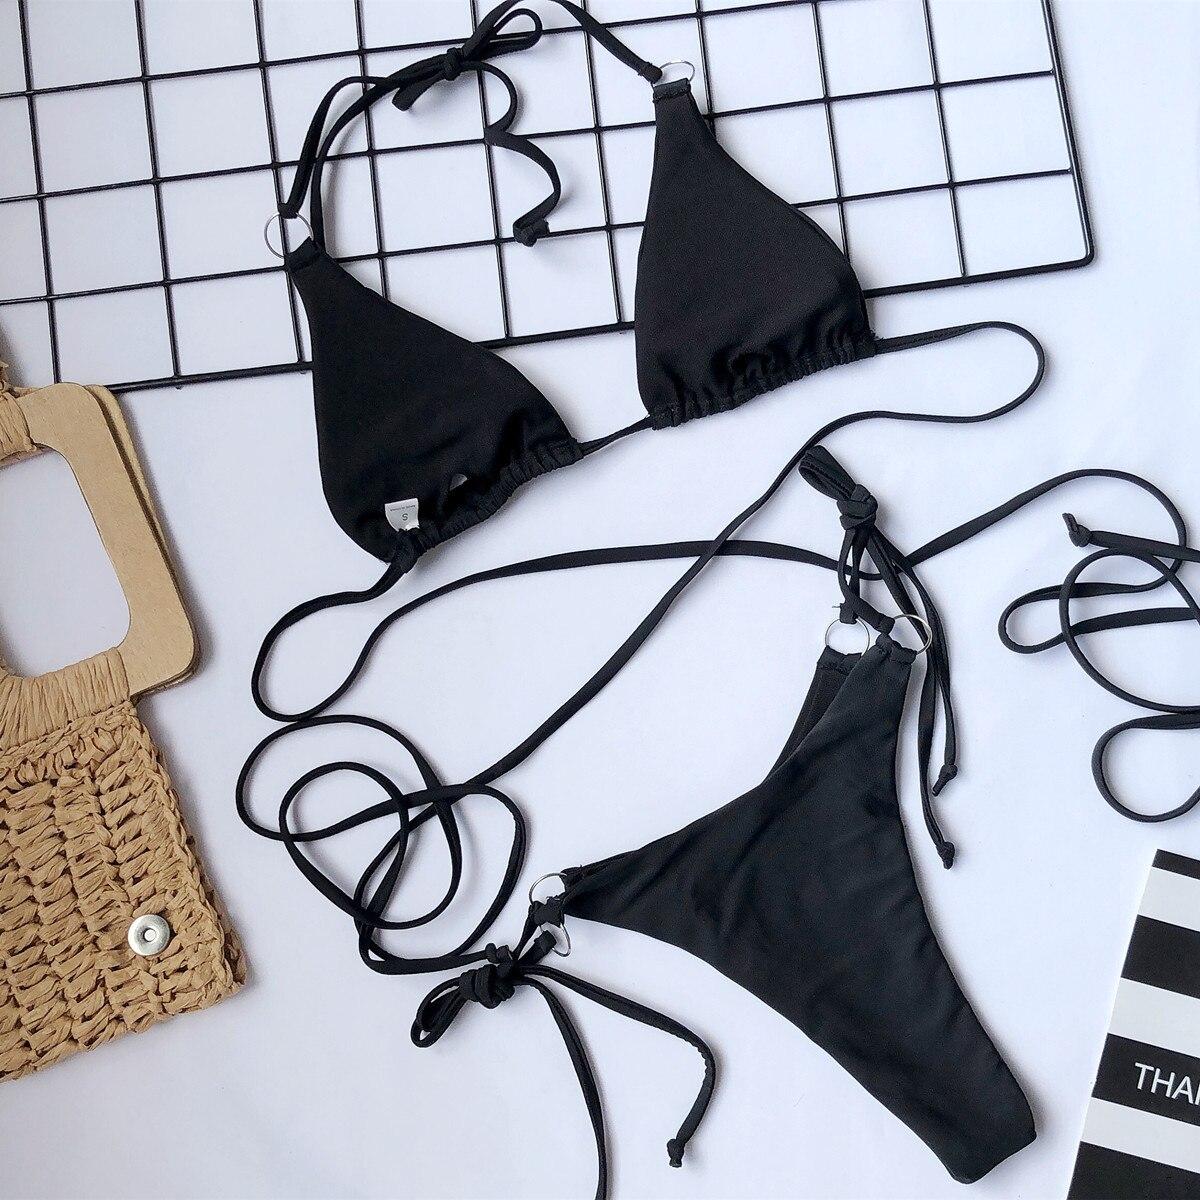 Sexy Women Bikini Brazilian Swimsuit Push-up Bra Bikini Set Two Piece Swim Suit Swimwear Beachwear Bathing Maillot De Bain Femme